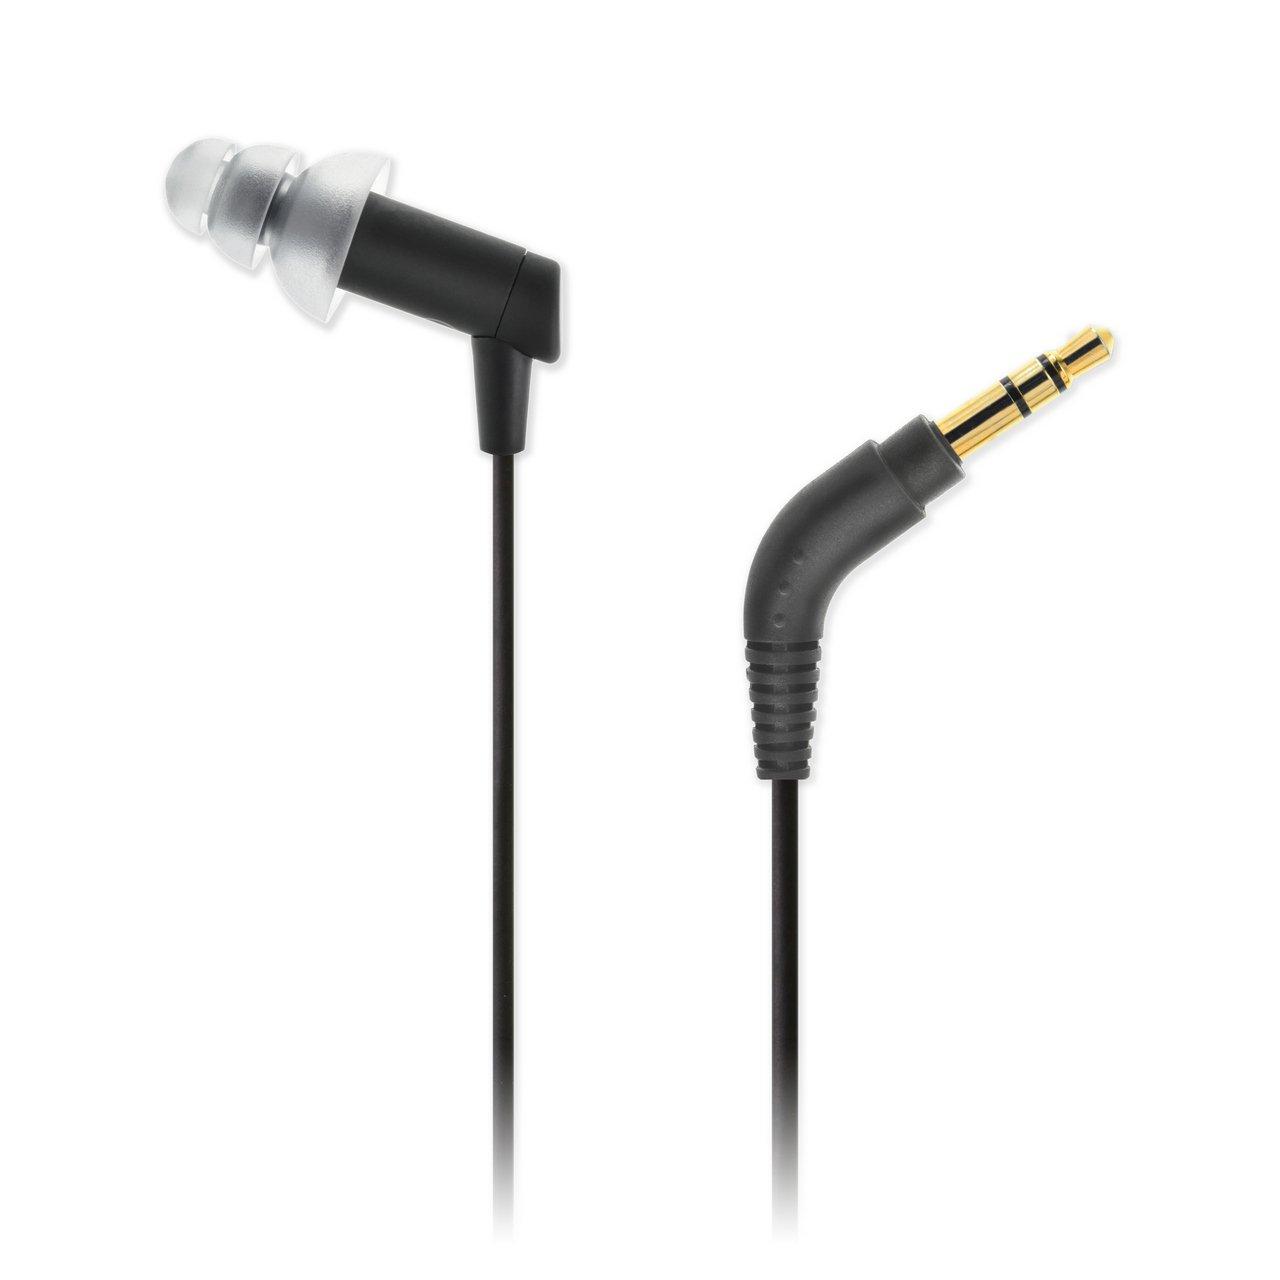 Amazon.com: Etymotic Research HF5 Noise-Isolating In-Ear Earphones, Black:  Home Audio & Theater